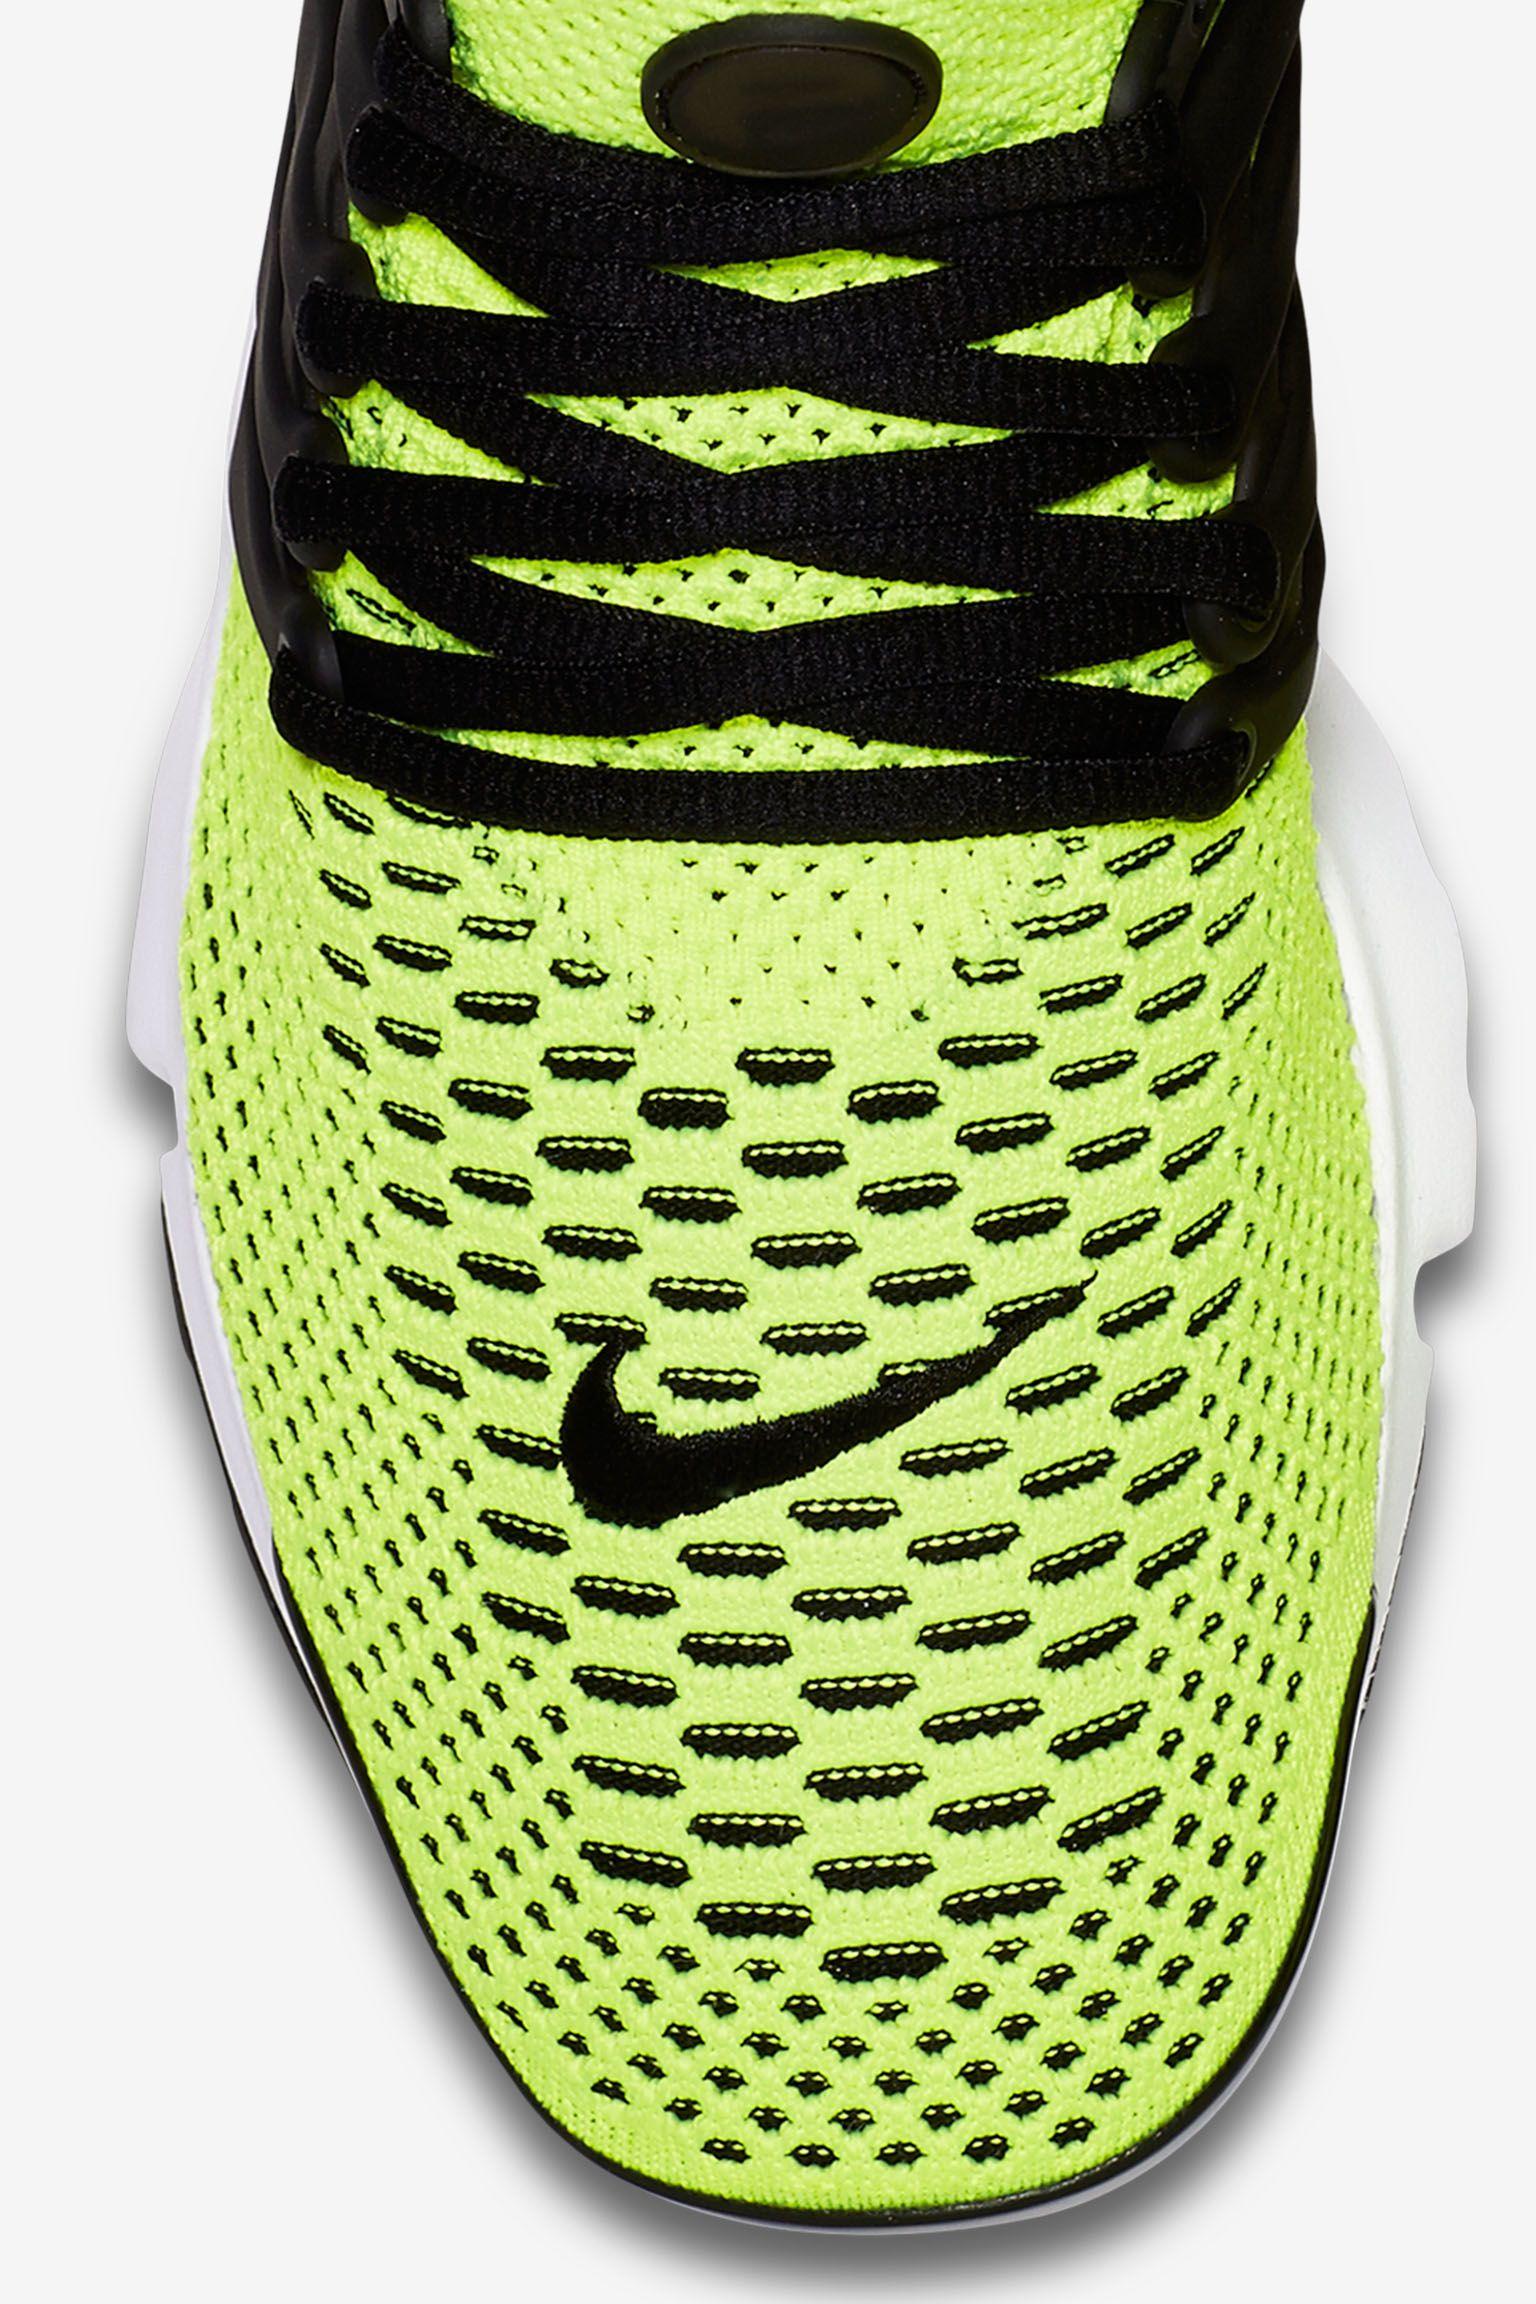 Nike Air Presto Ultra Flyknit 'Volt & Black' Release Date